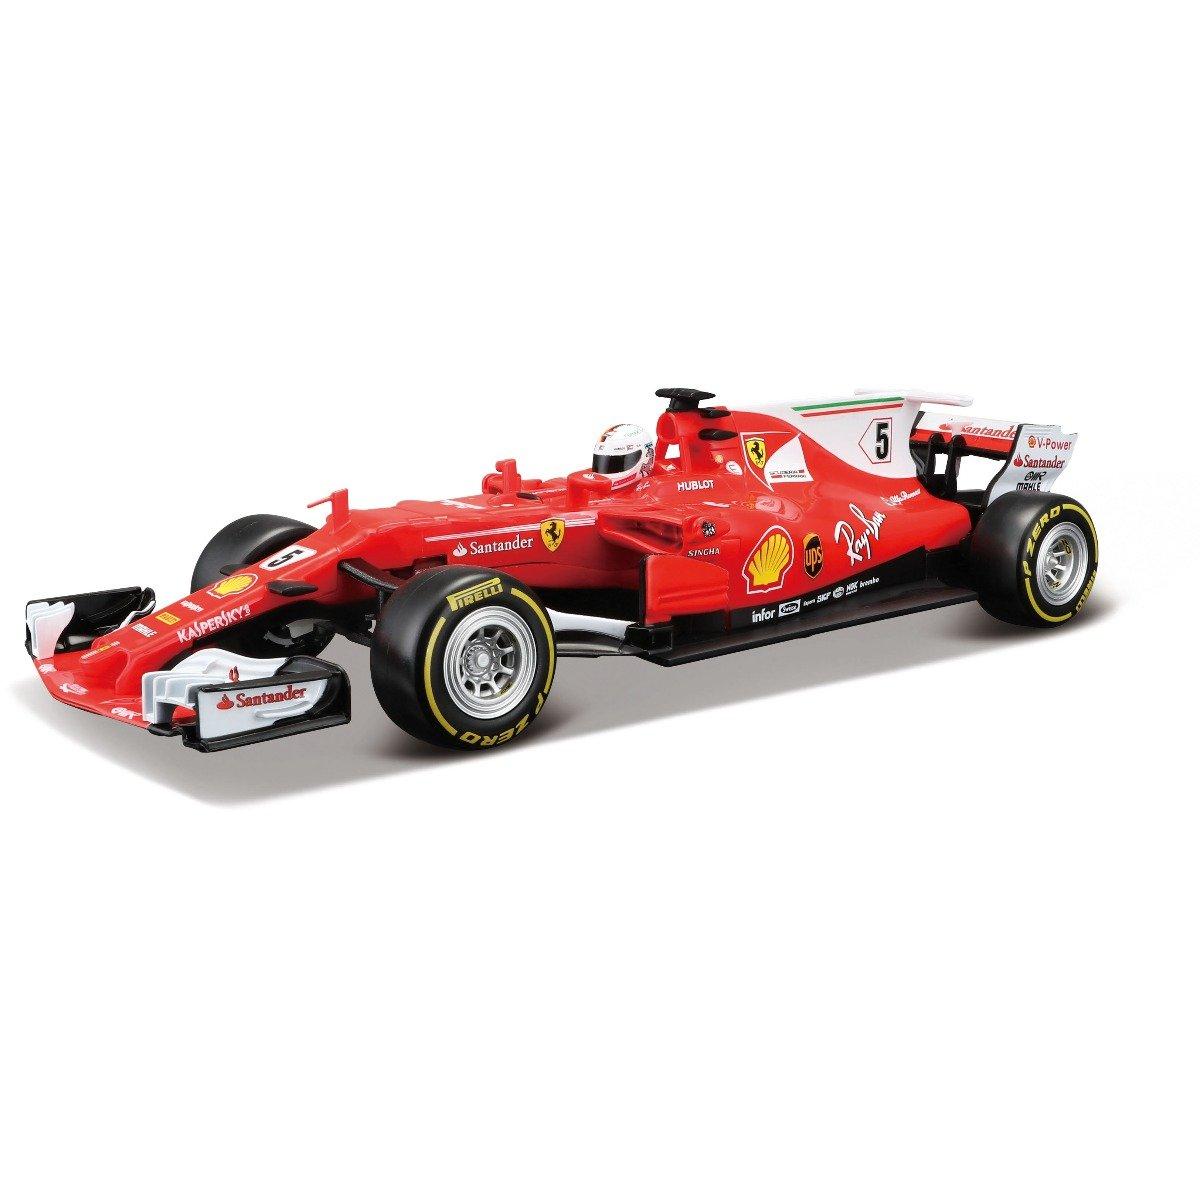 Masinuta cu telecomanda Maisto Ferrari SF70H, 1:24, 27 MHz